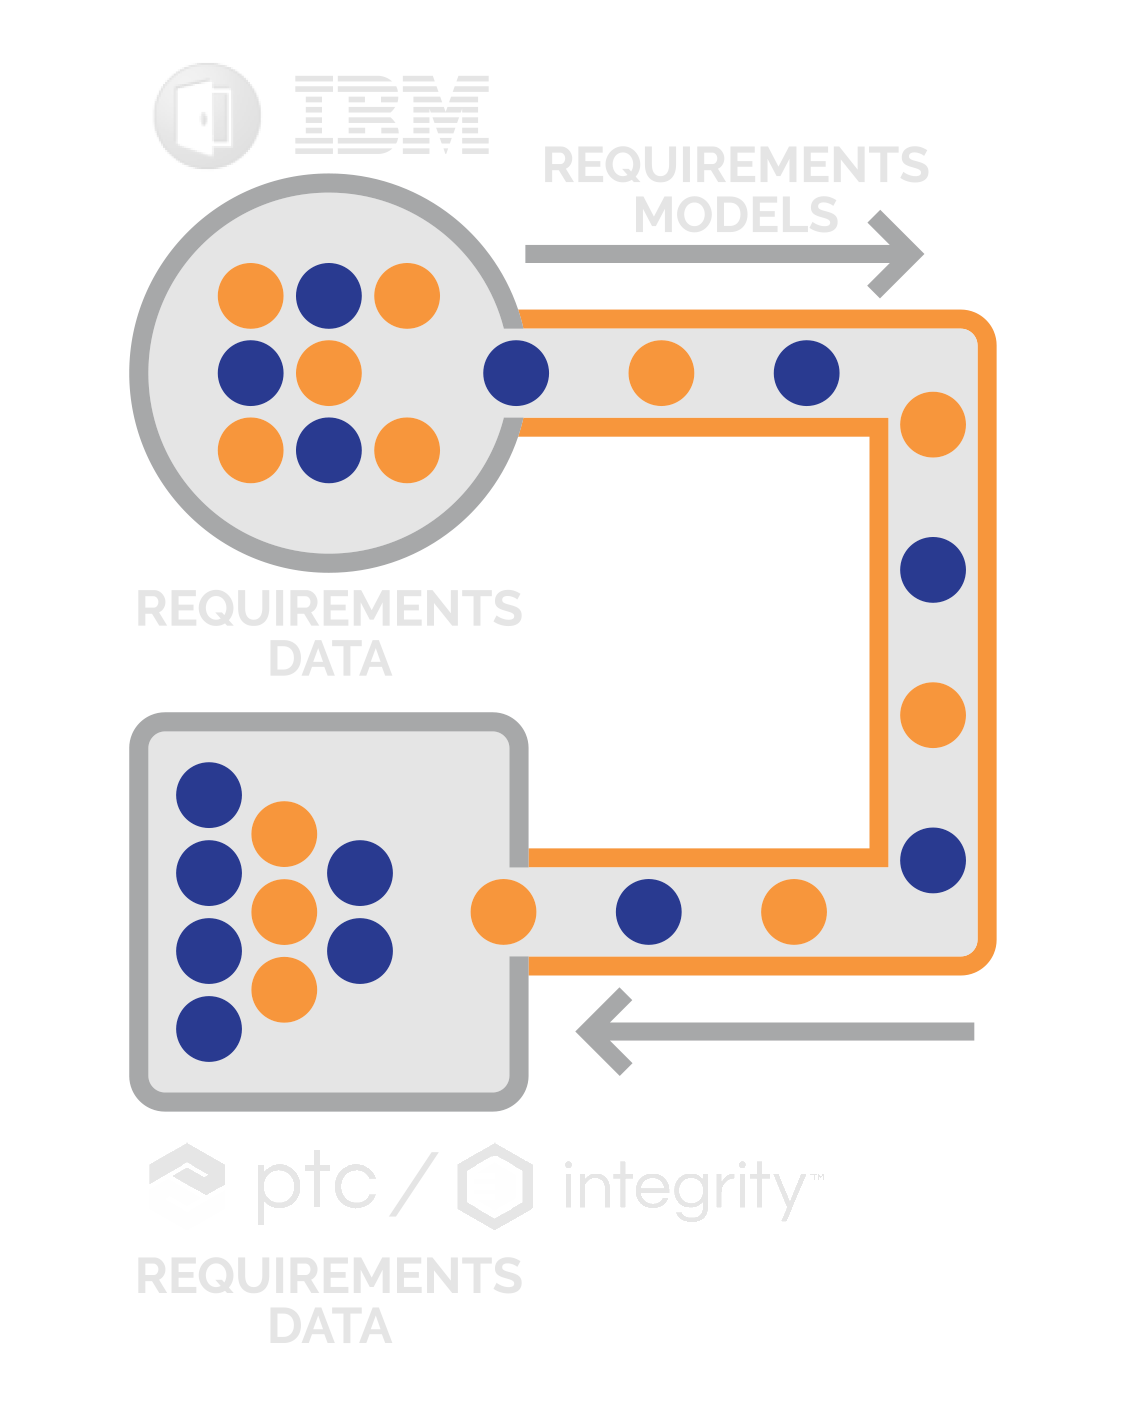 Data synchronization between DOORS & PTC Integrity